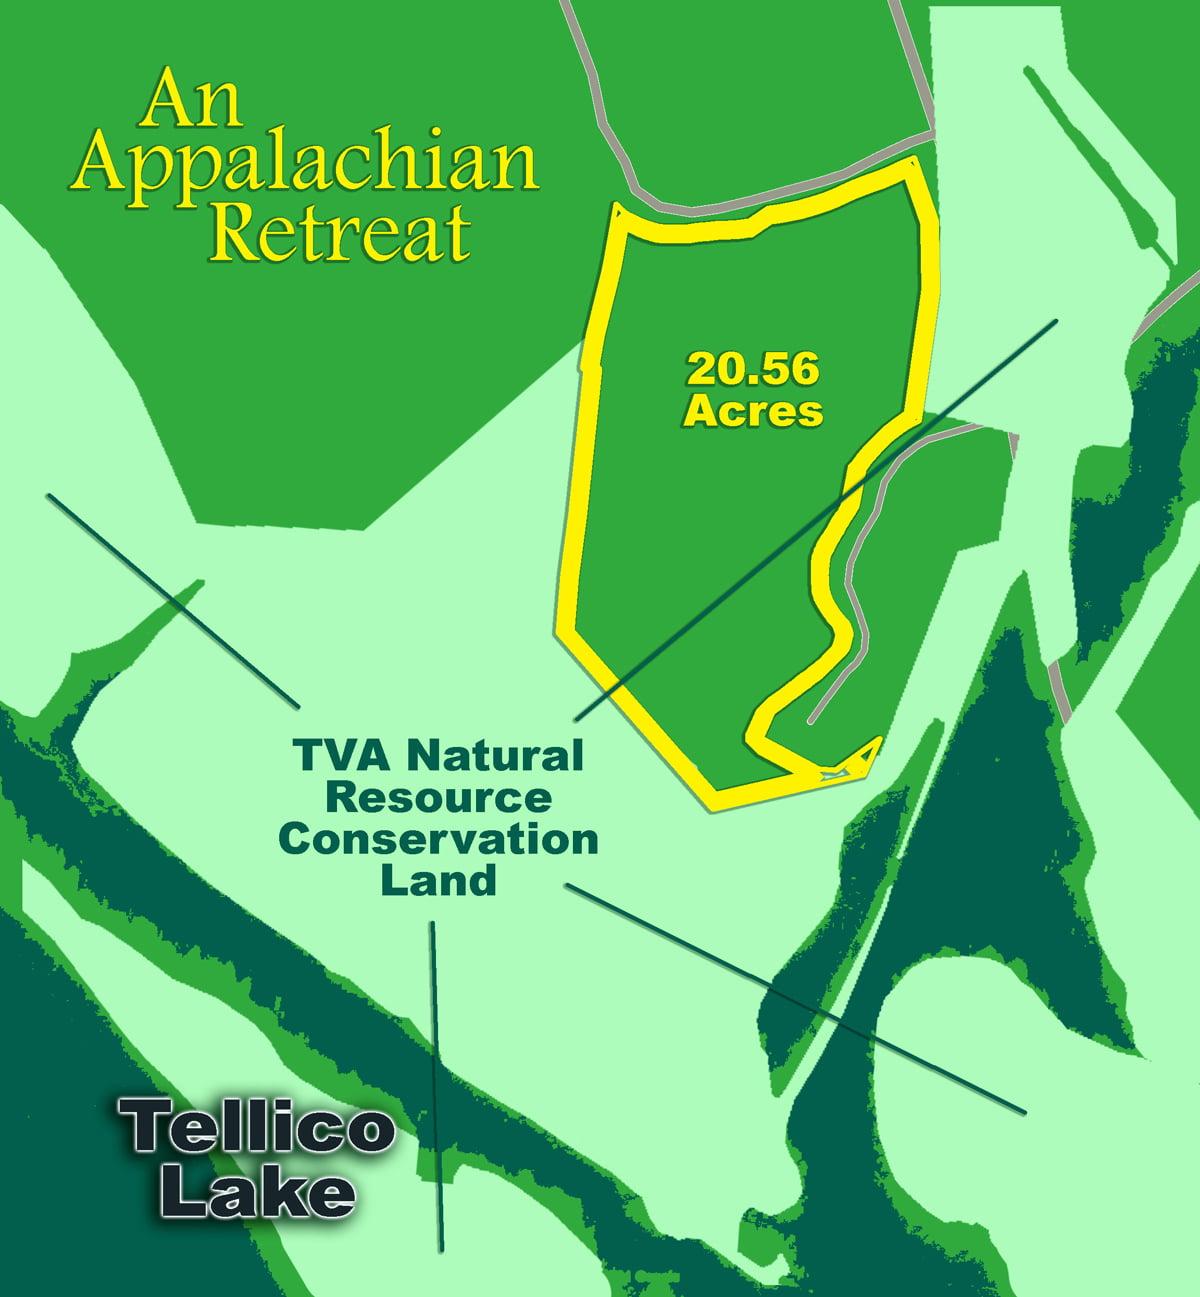 An Appalachian Retreat